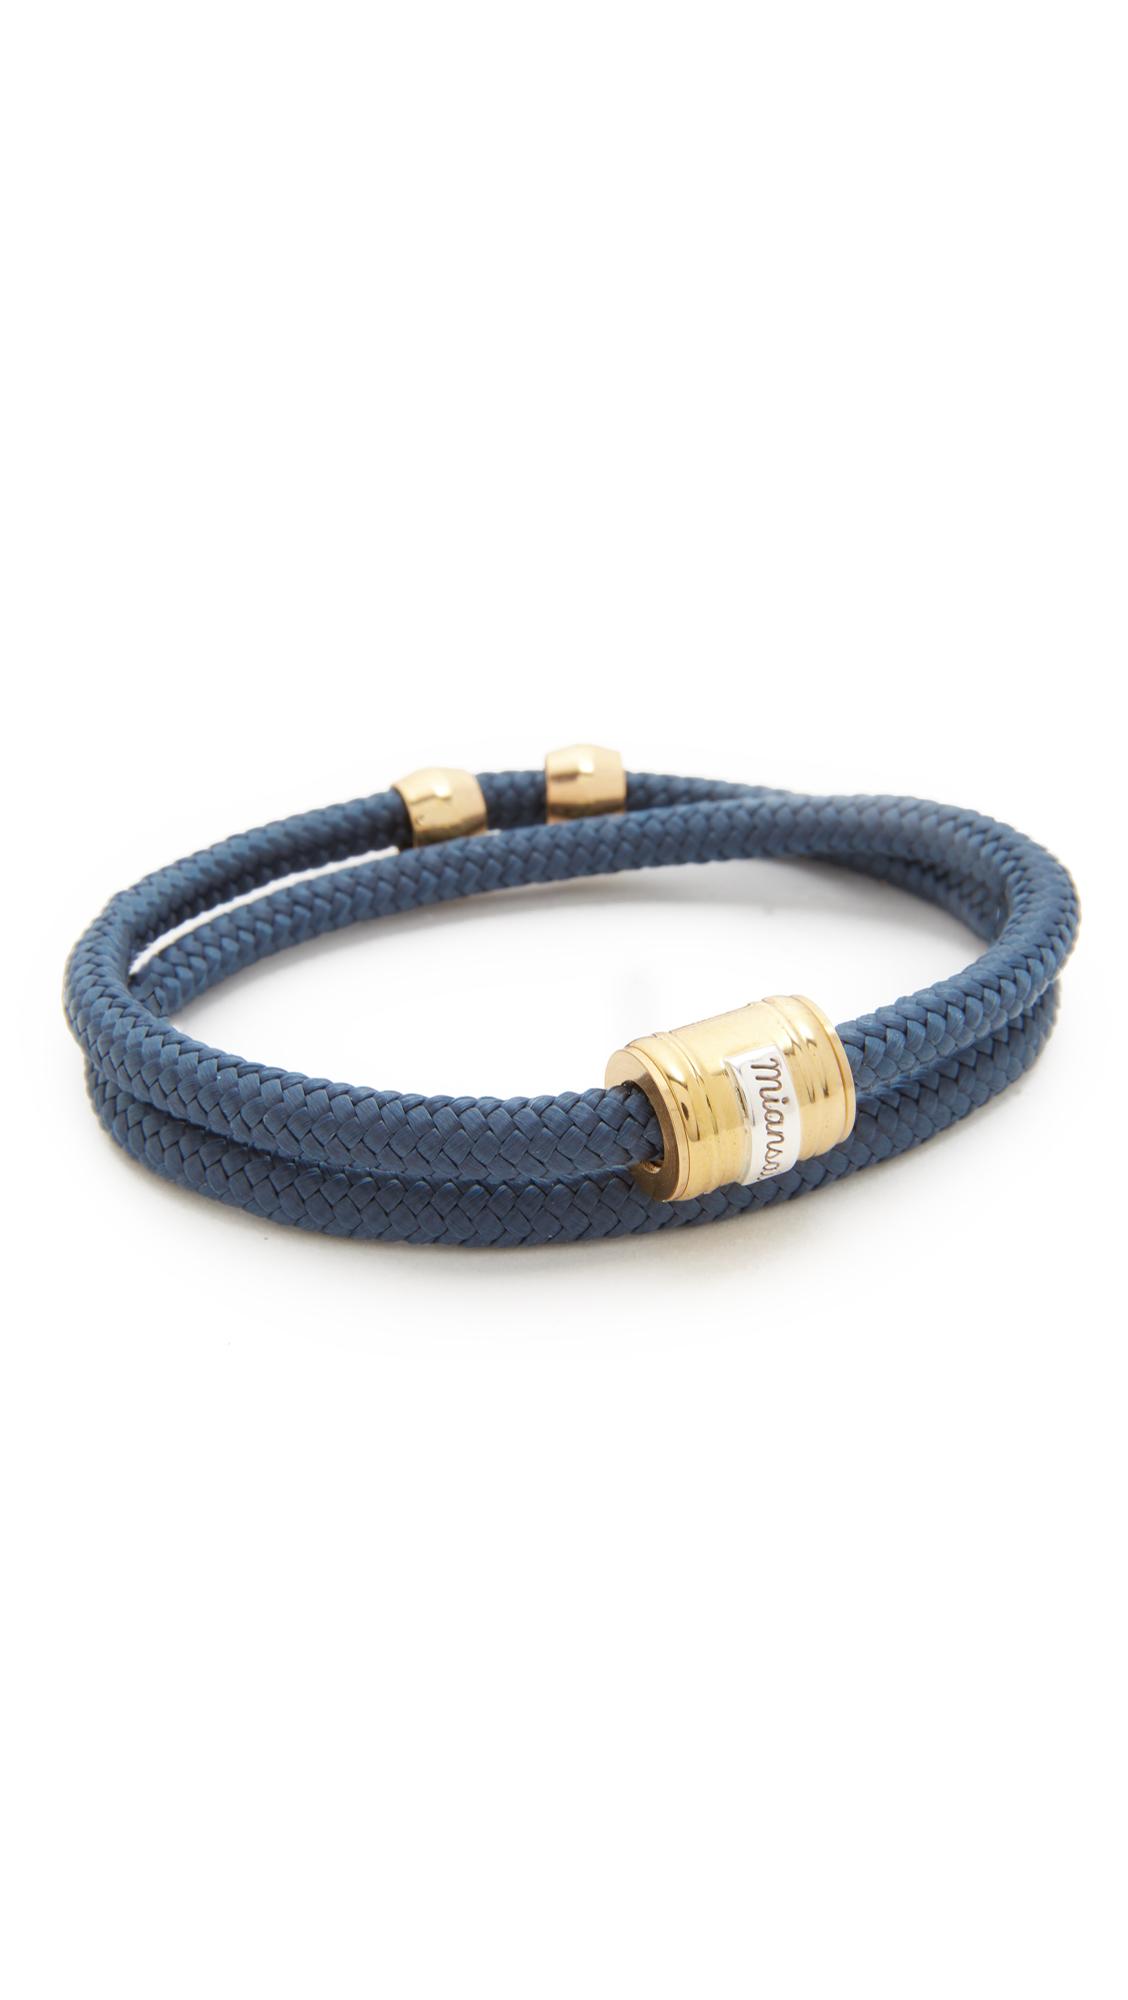 Miansai Casing Rope Bracelet - Brass/Solid Navy SFLh6